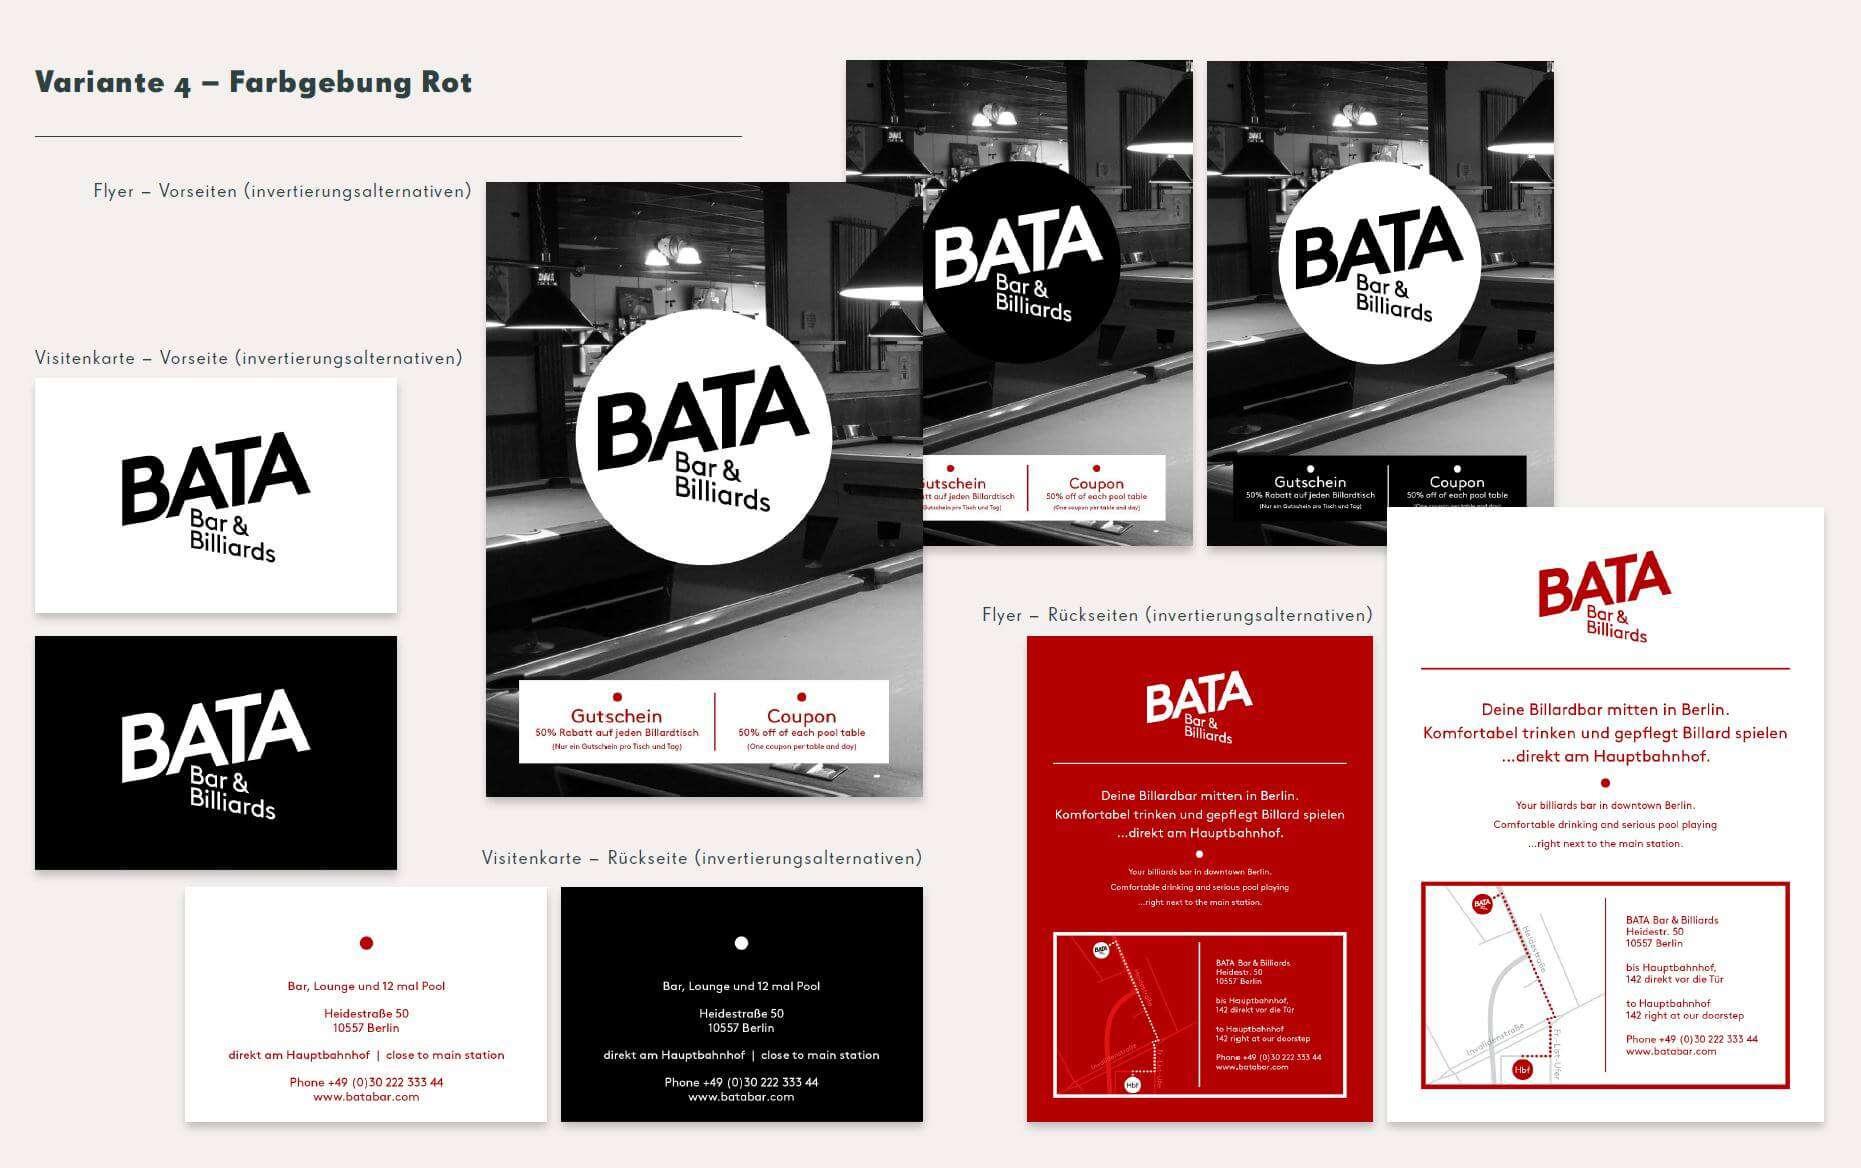 Es geht voran! › Bata Bar & Billiards